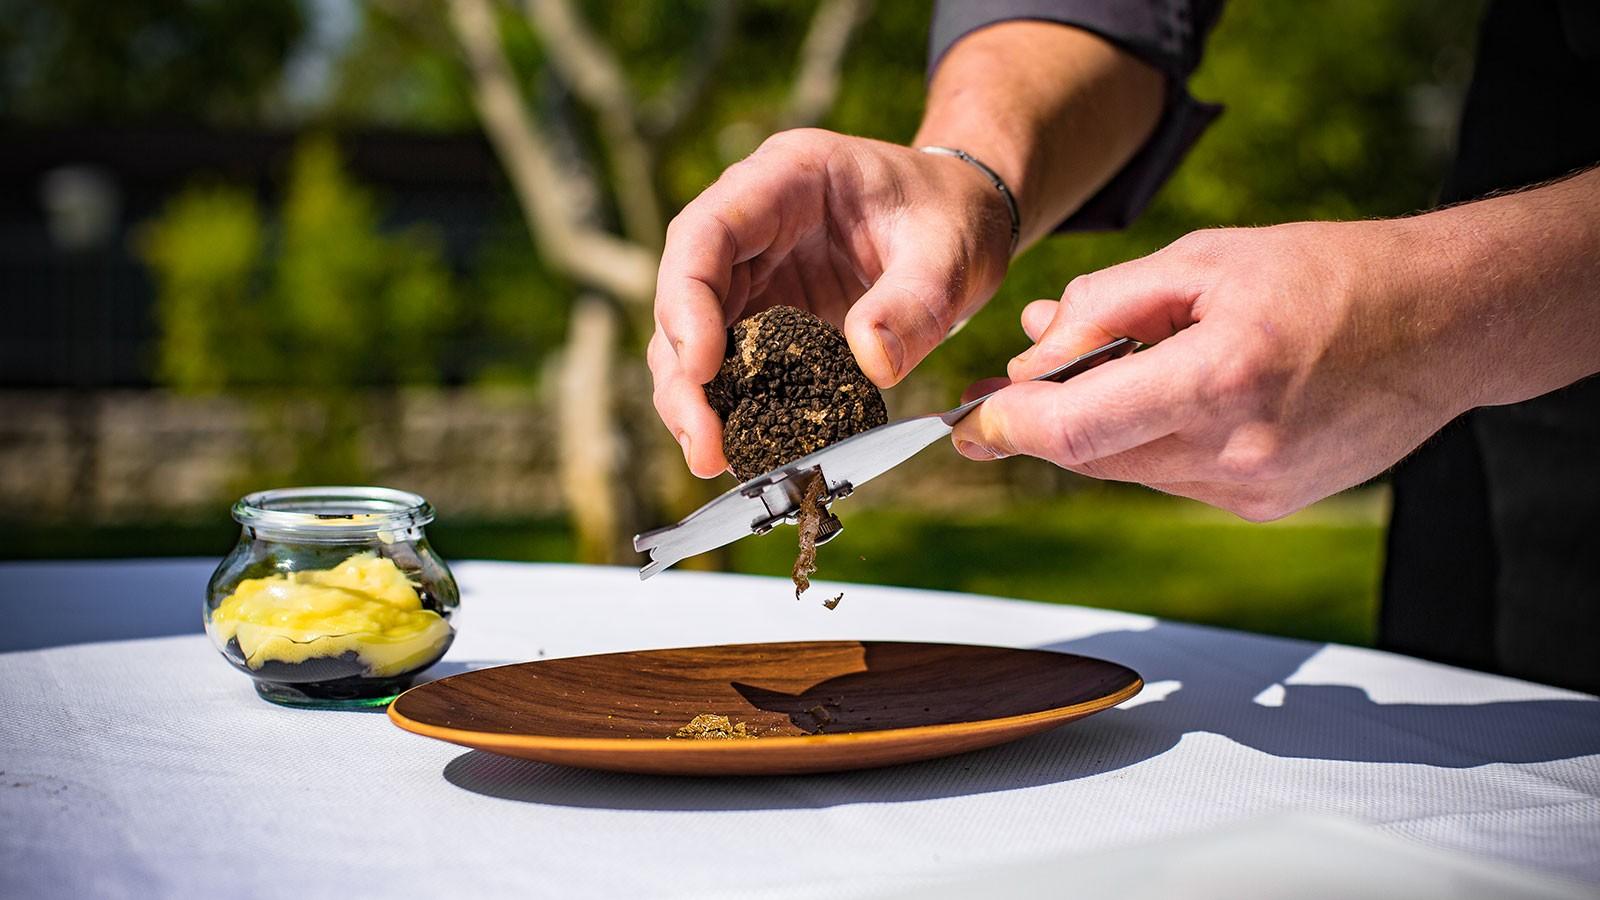 are-truffles-vegan!?